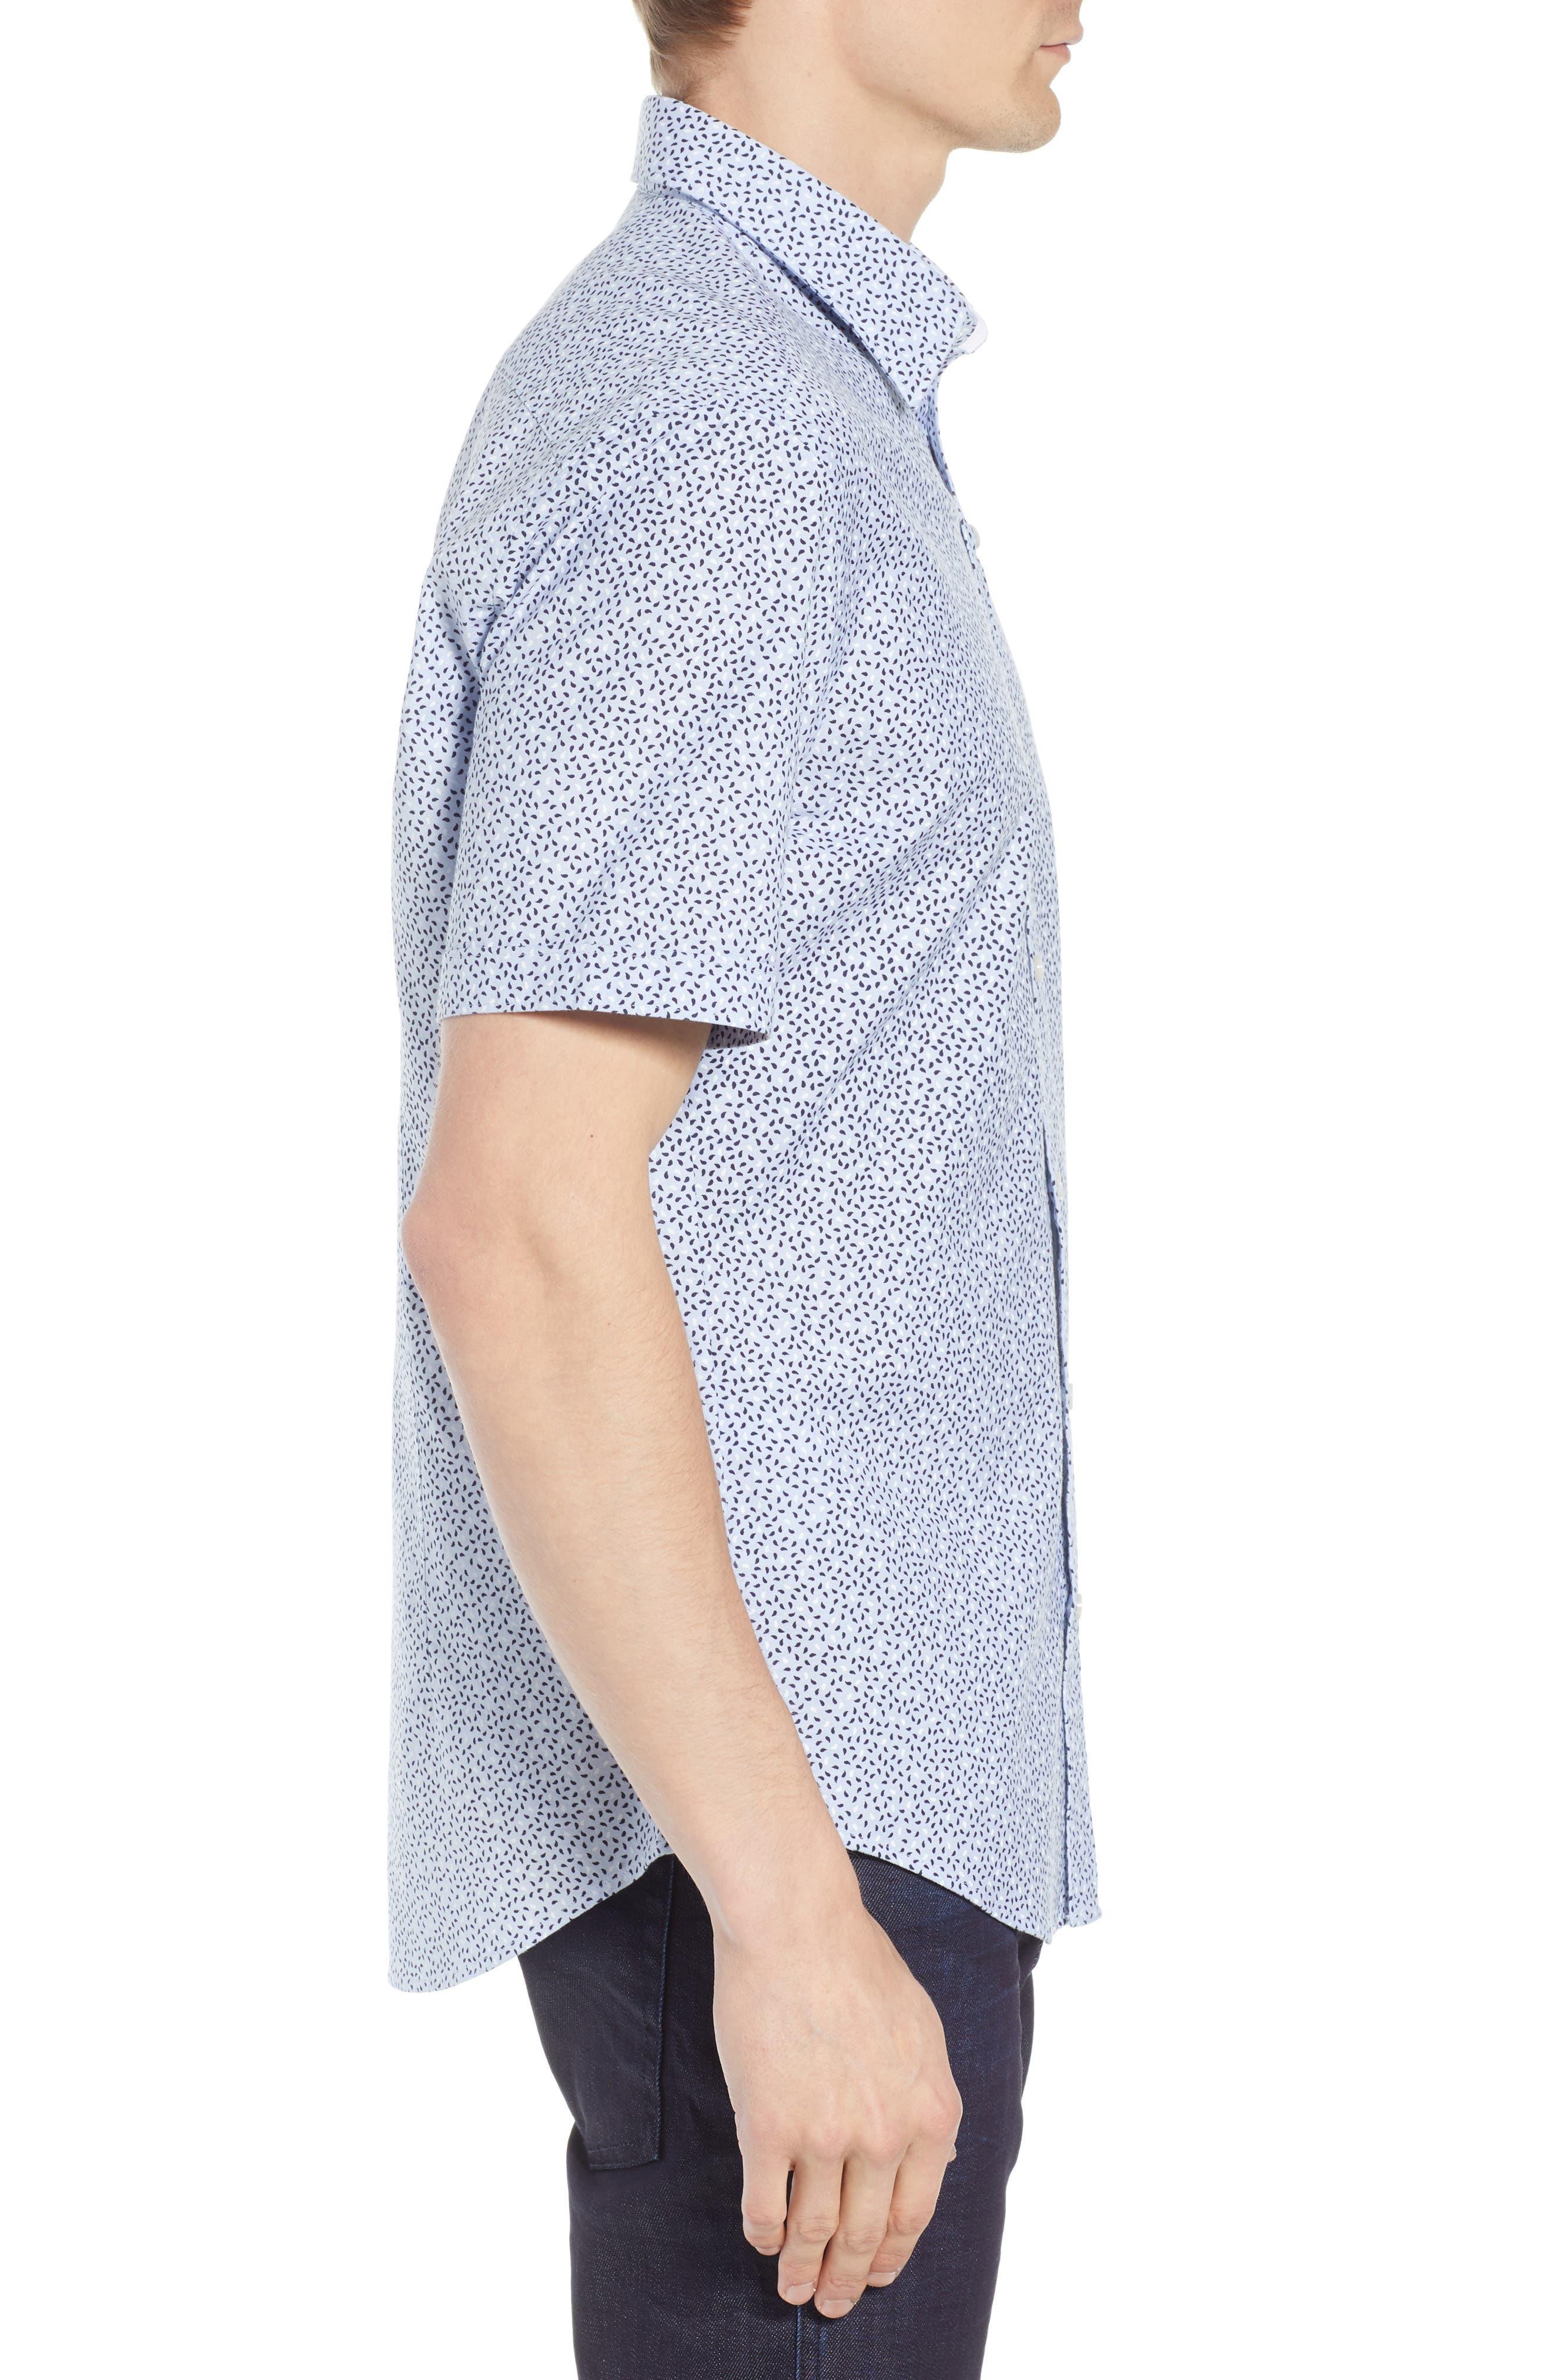 Robb Trim Fit Paisley Sport Shirt,                             Alternate thumbnail 4, color,                             Blue